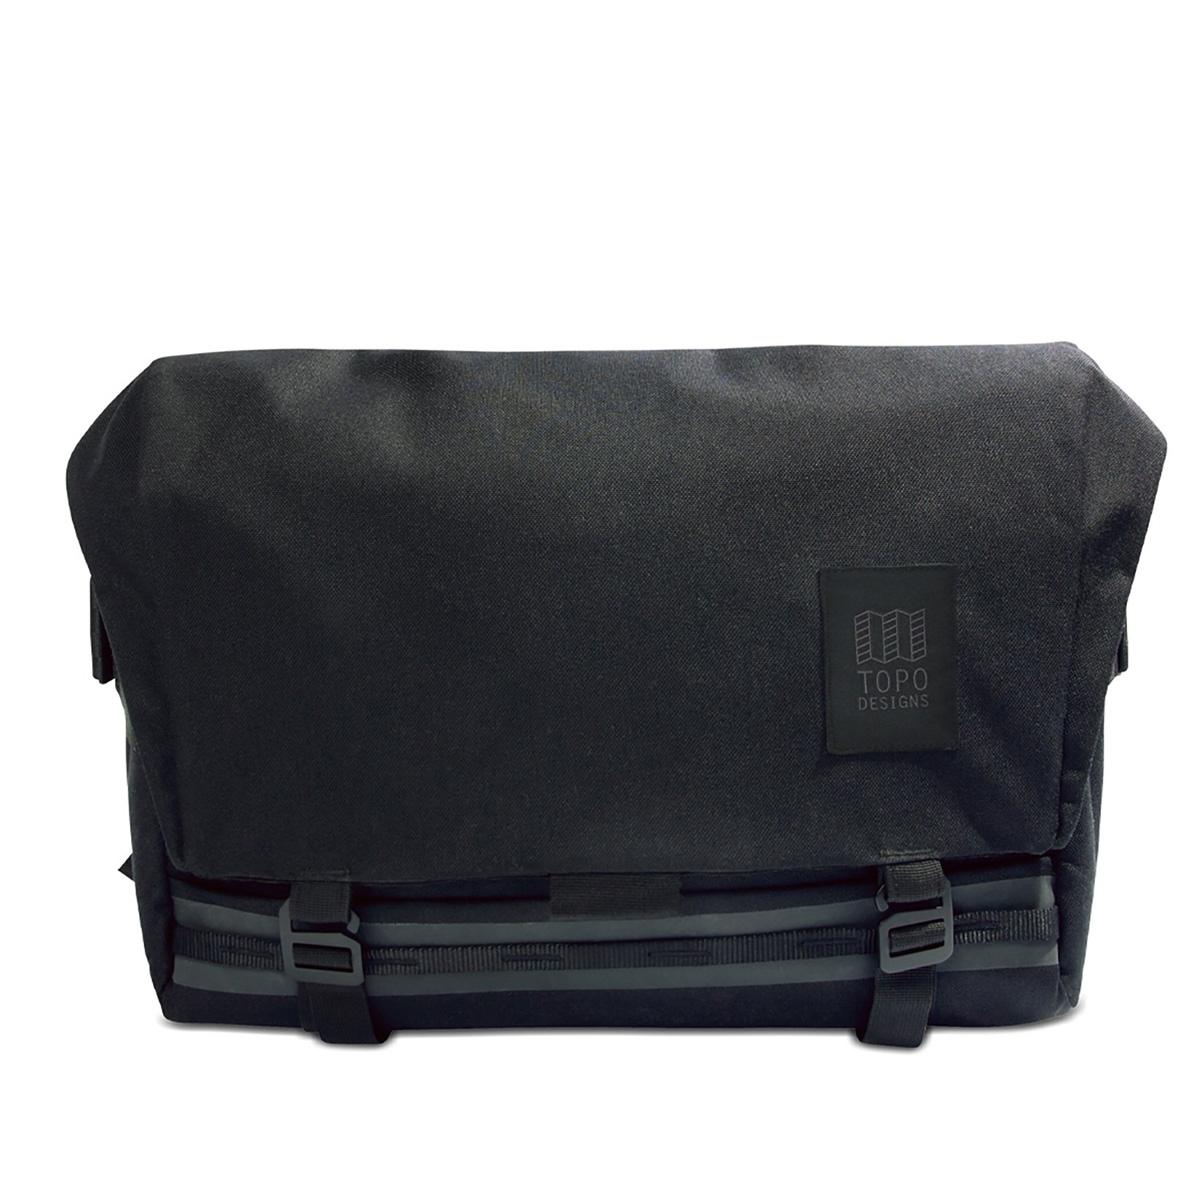 Topo Designs Messenger Bag Black